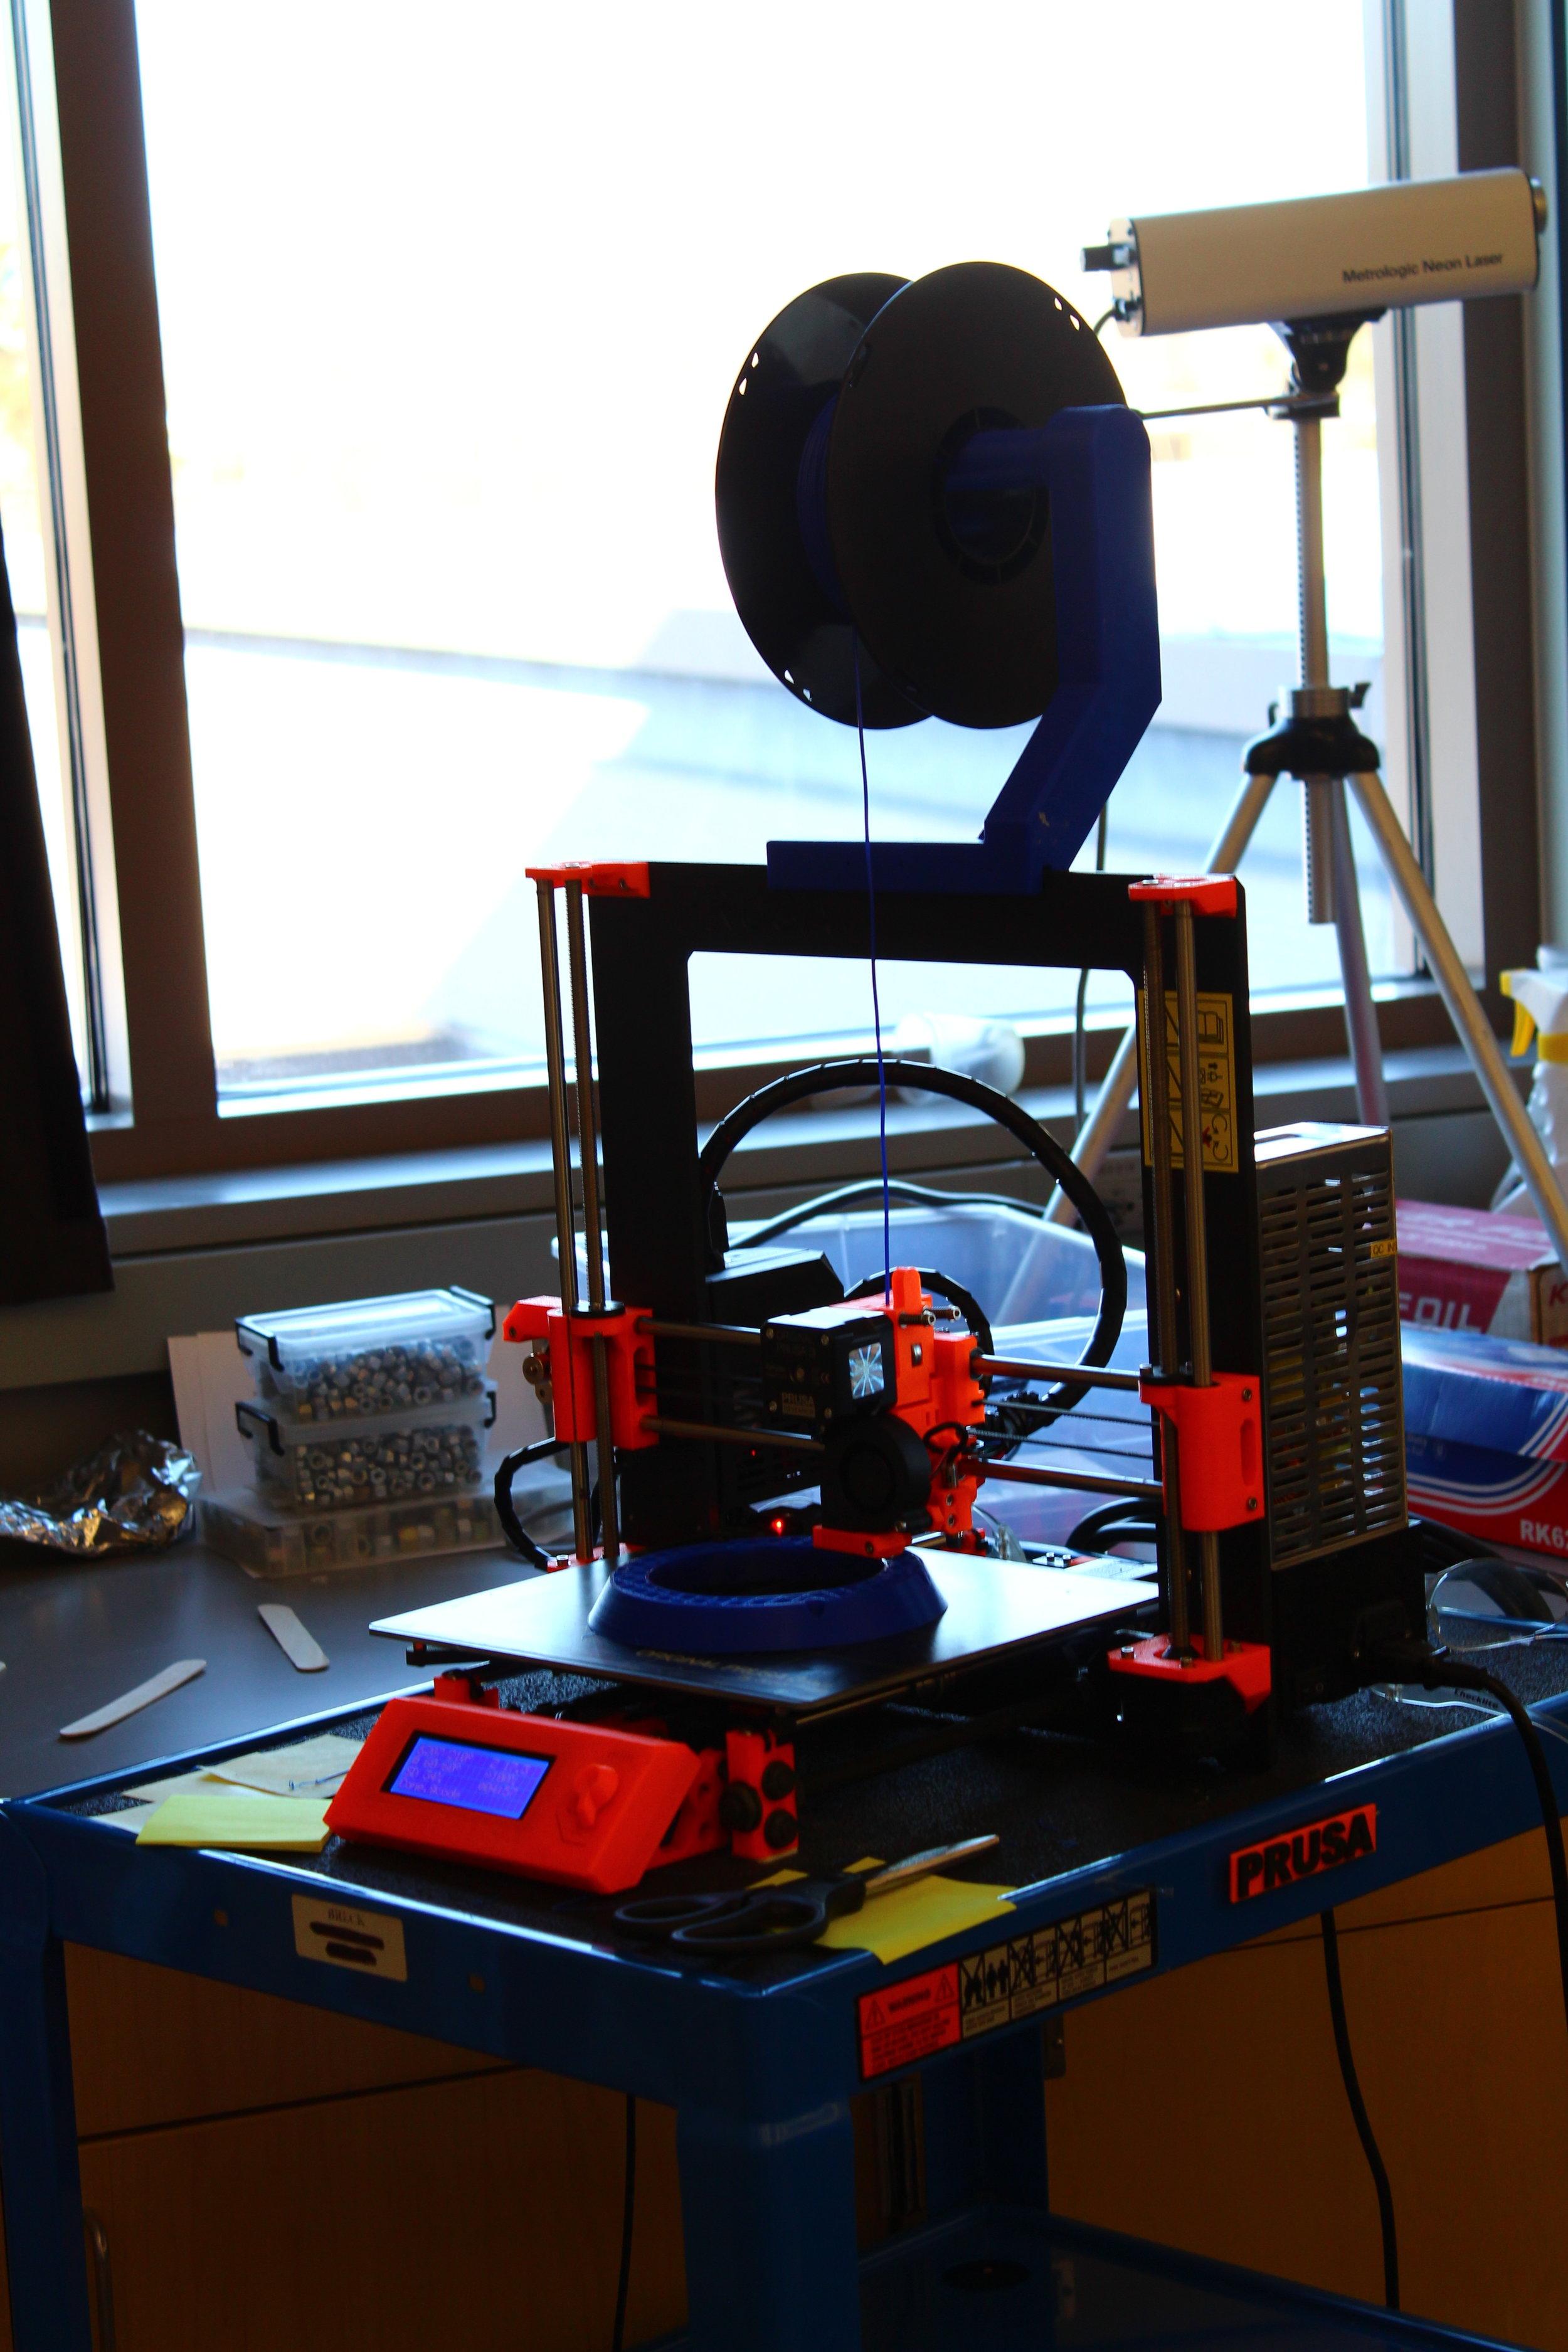 Our friend, the 3D printer